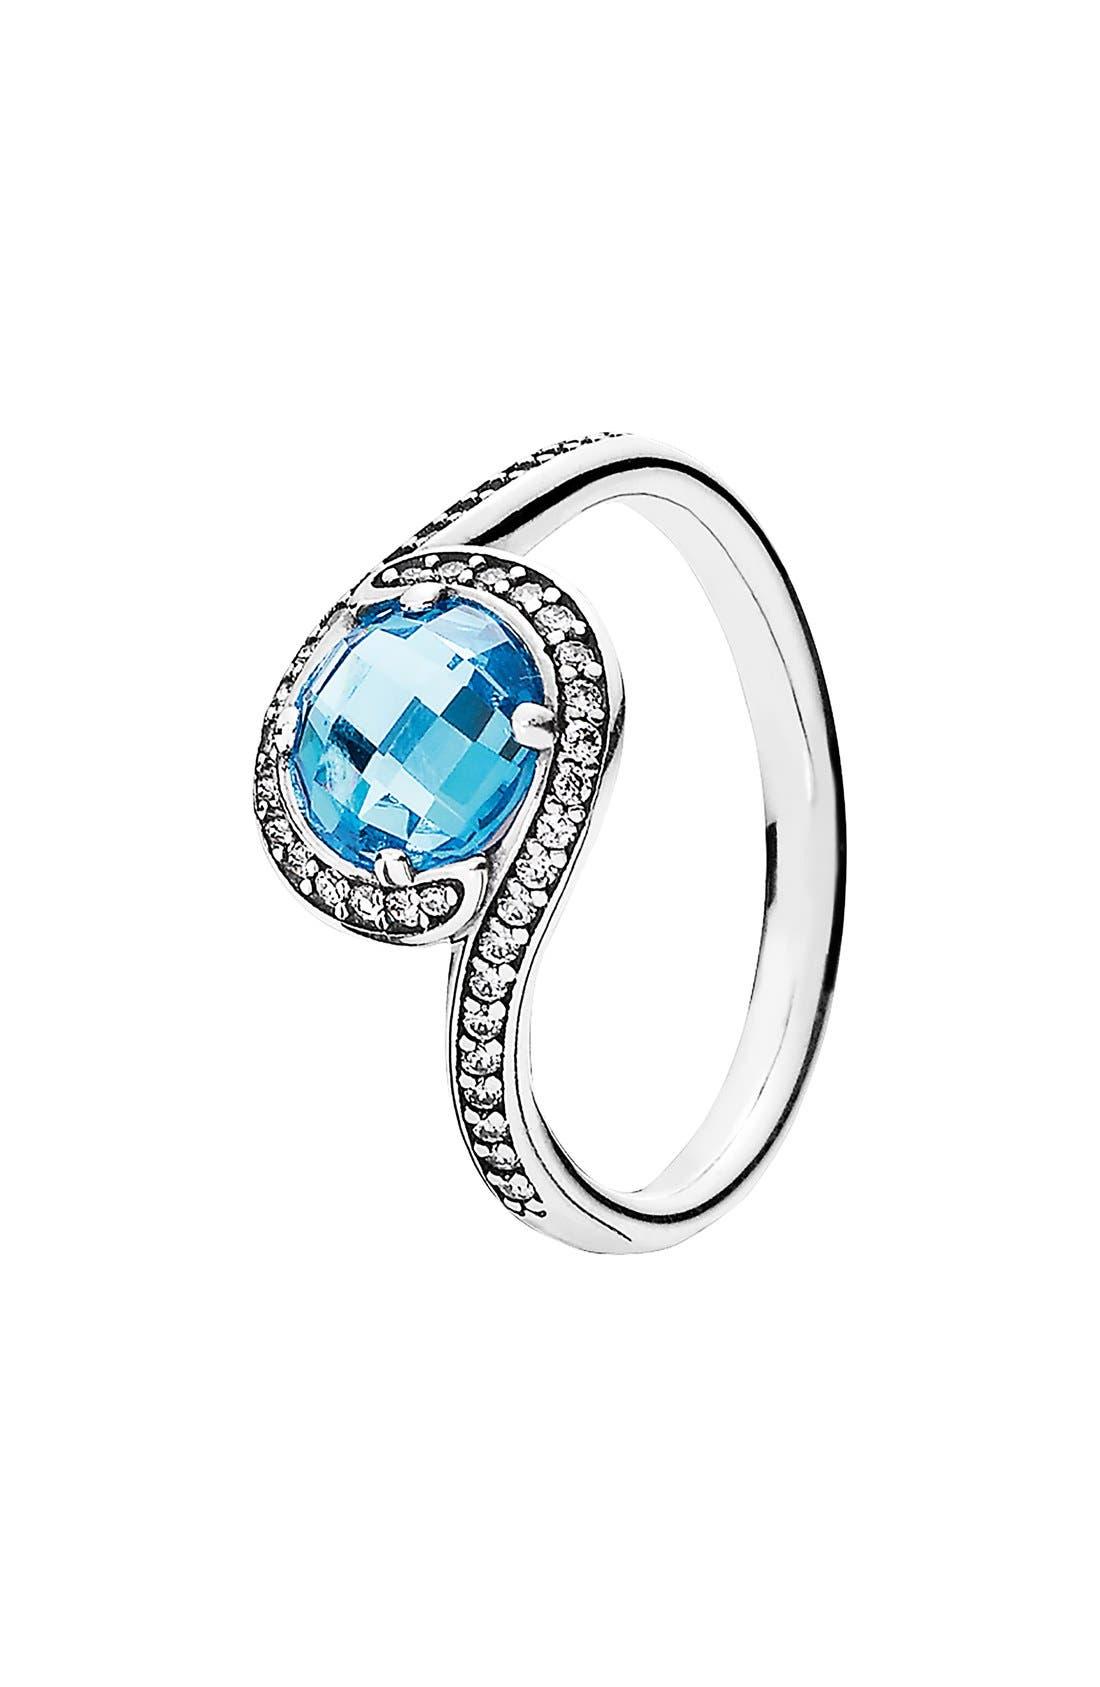 Main Image - PANDORA 'Radiant Embellish' Cubic Zirconia Ring